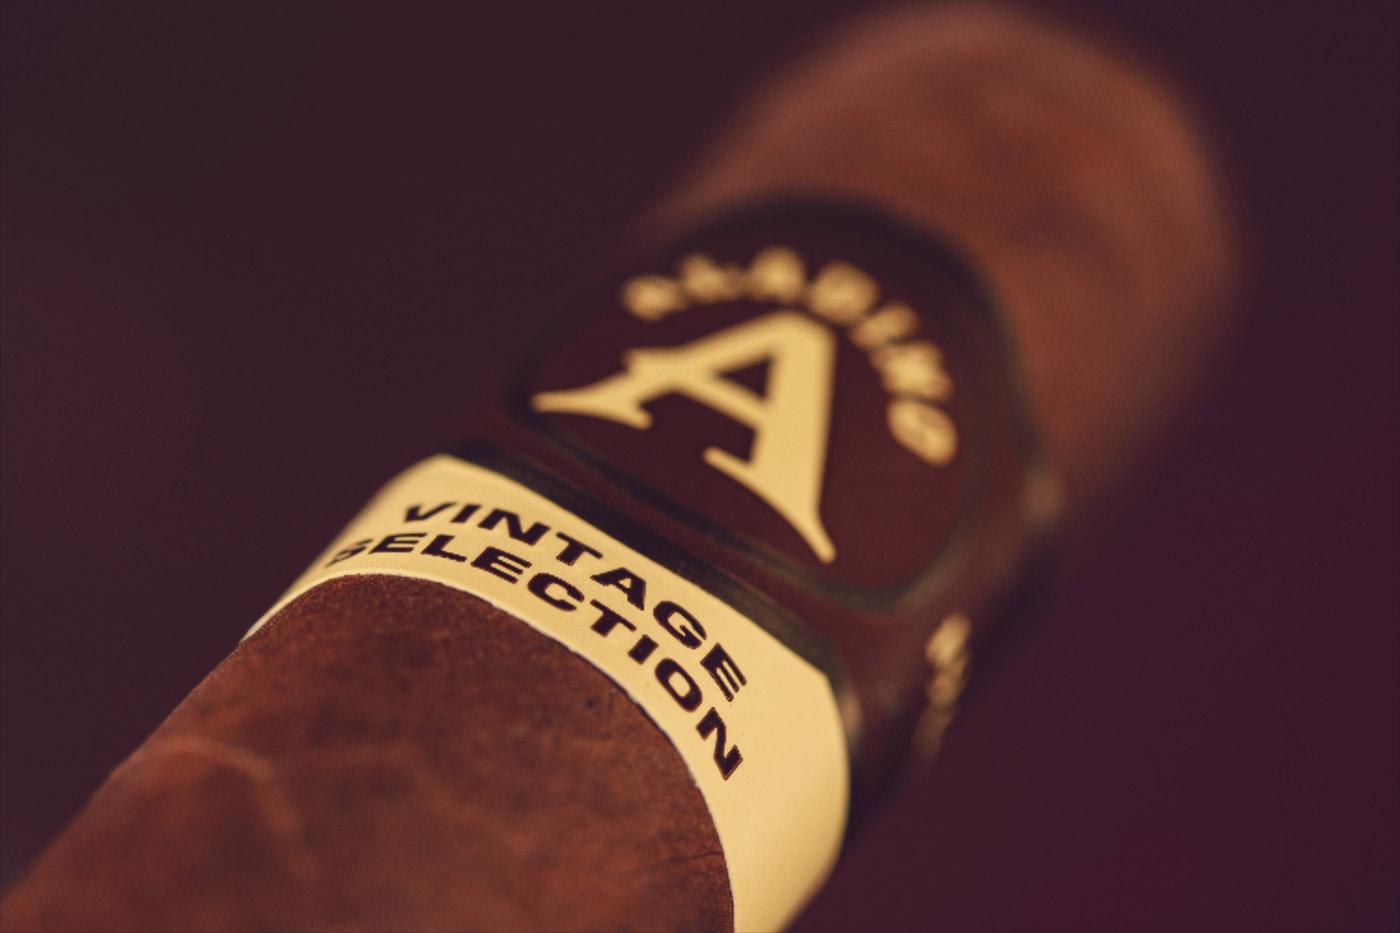 Aladino Habano Vintage Selection Rothschild cigar review